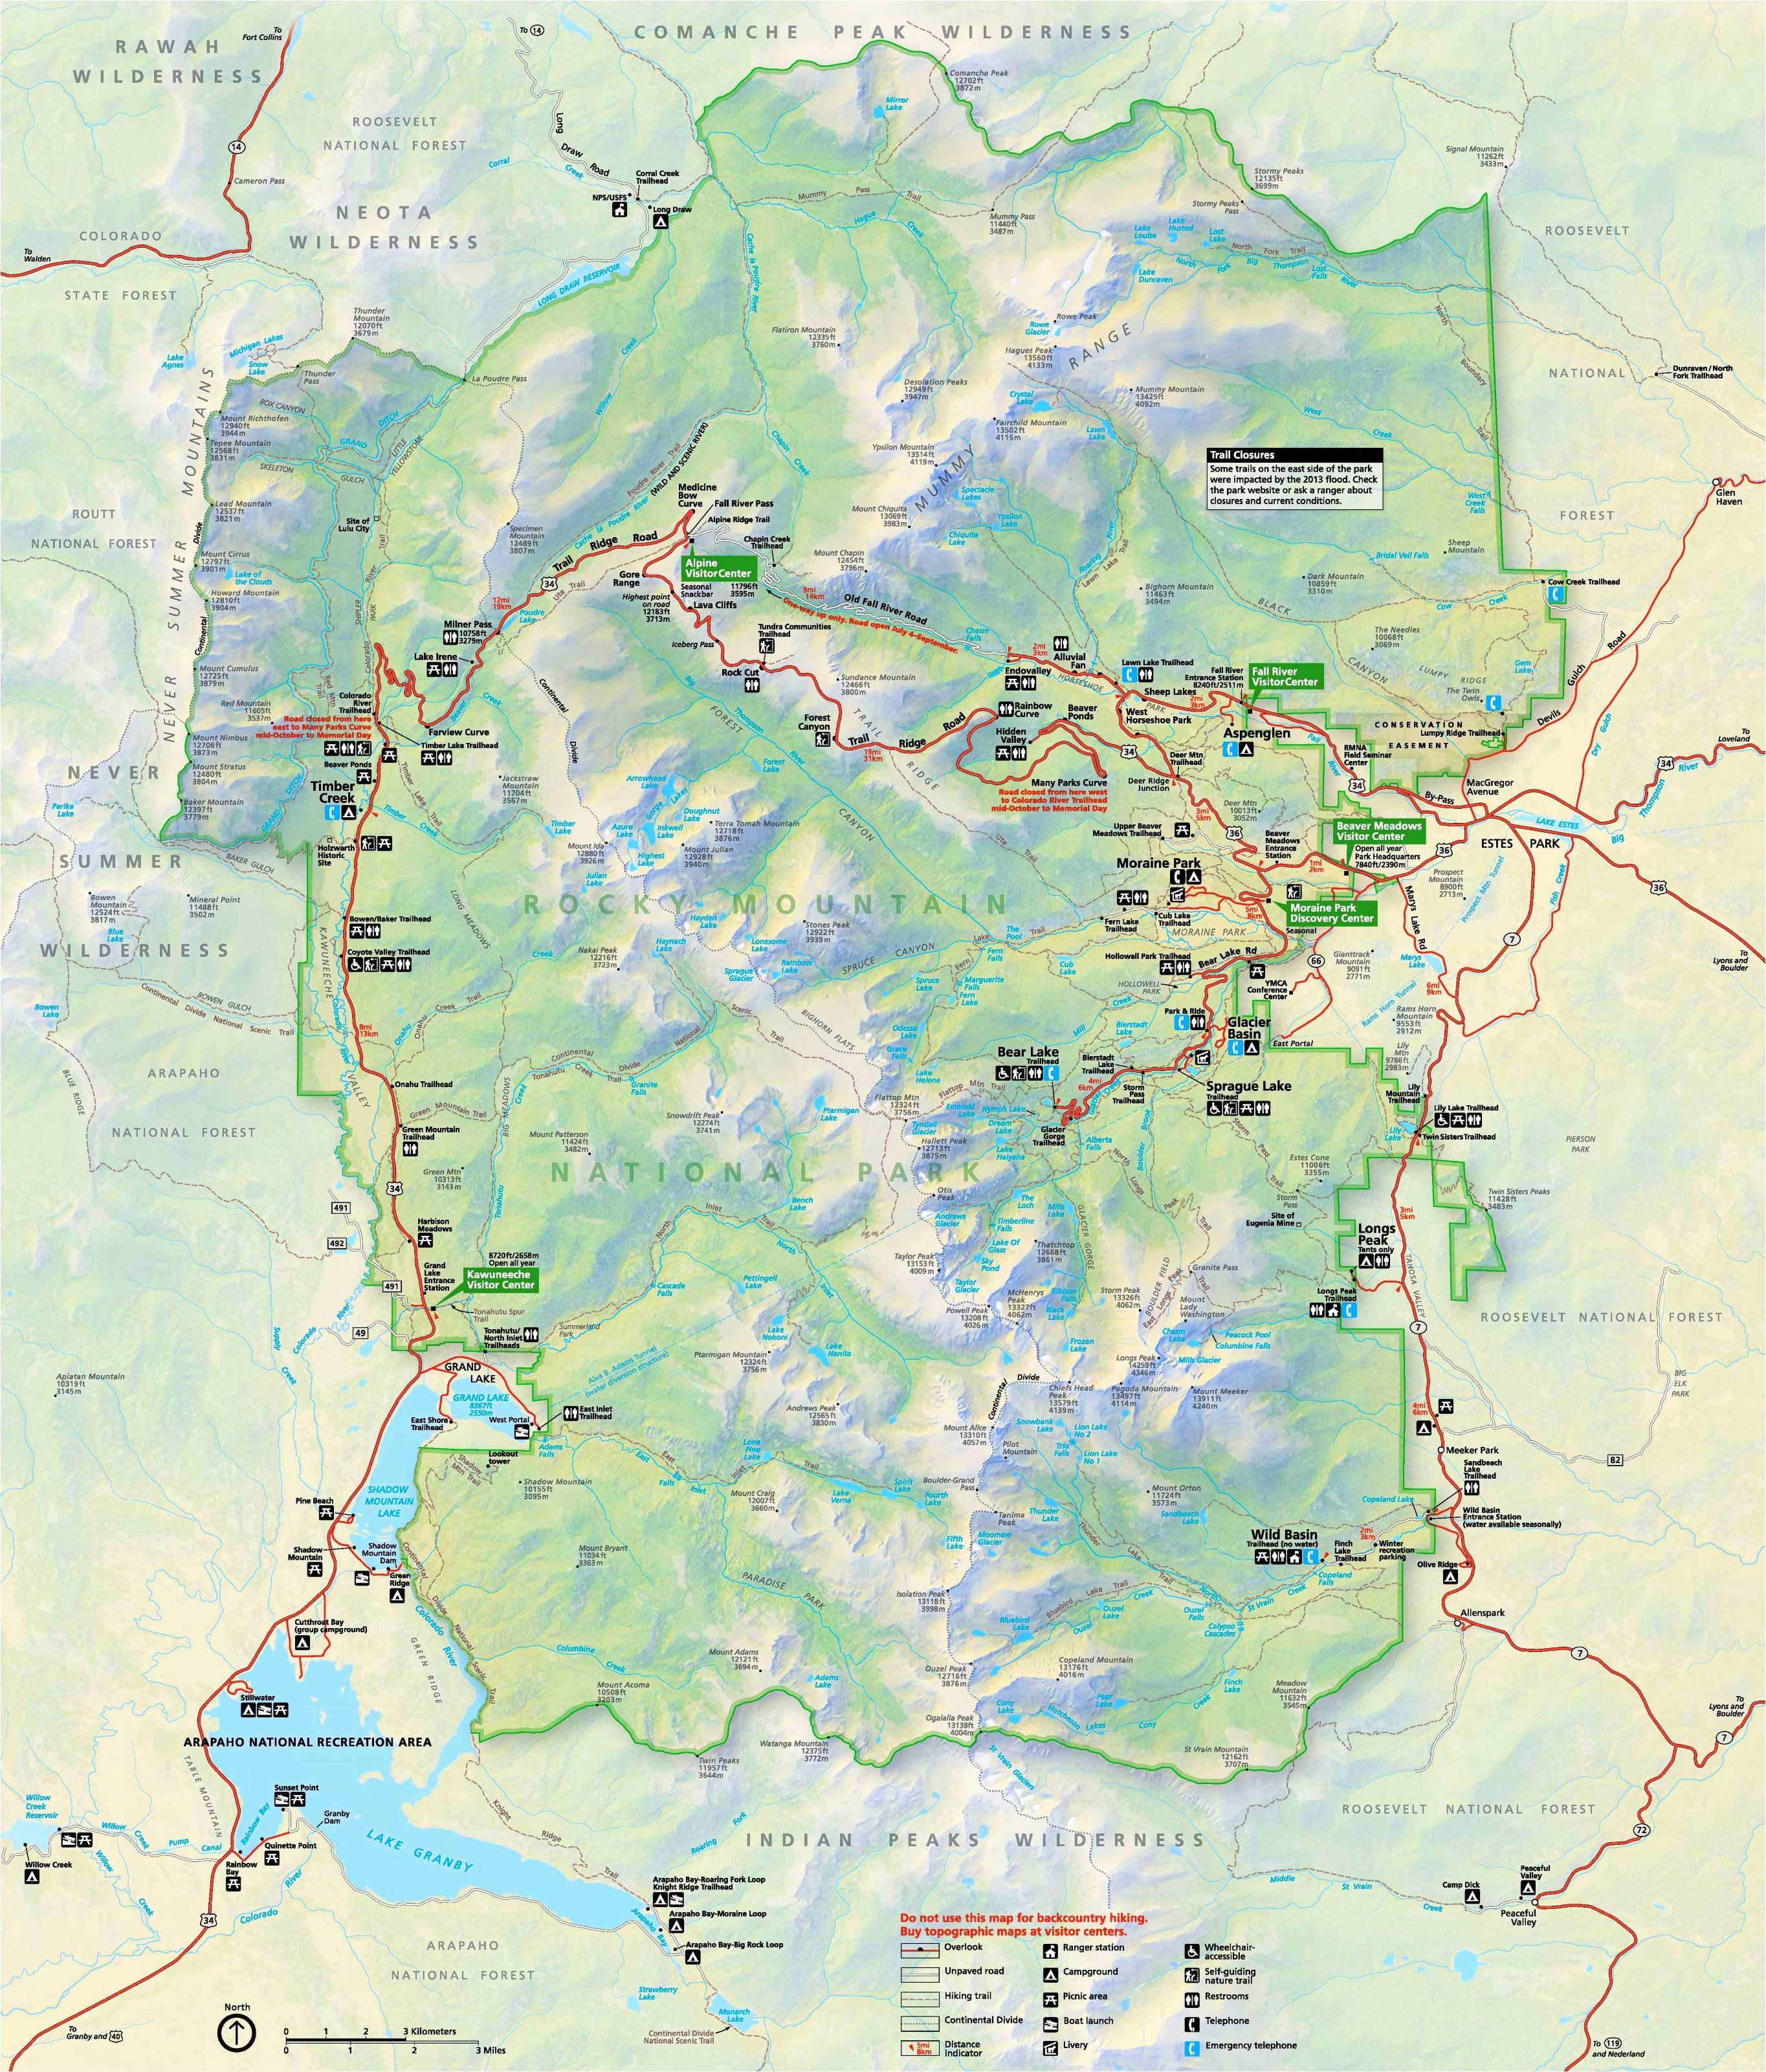 rocky mountain national park maps usa maps of rocky mountain